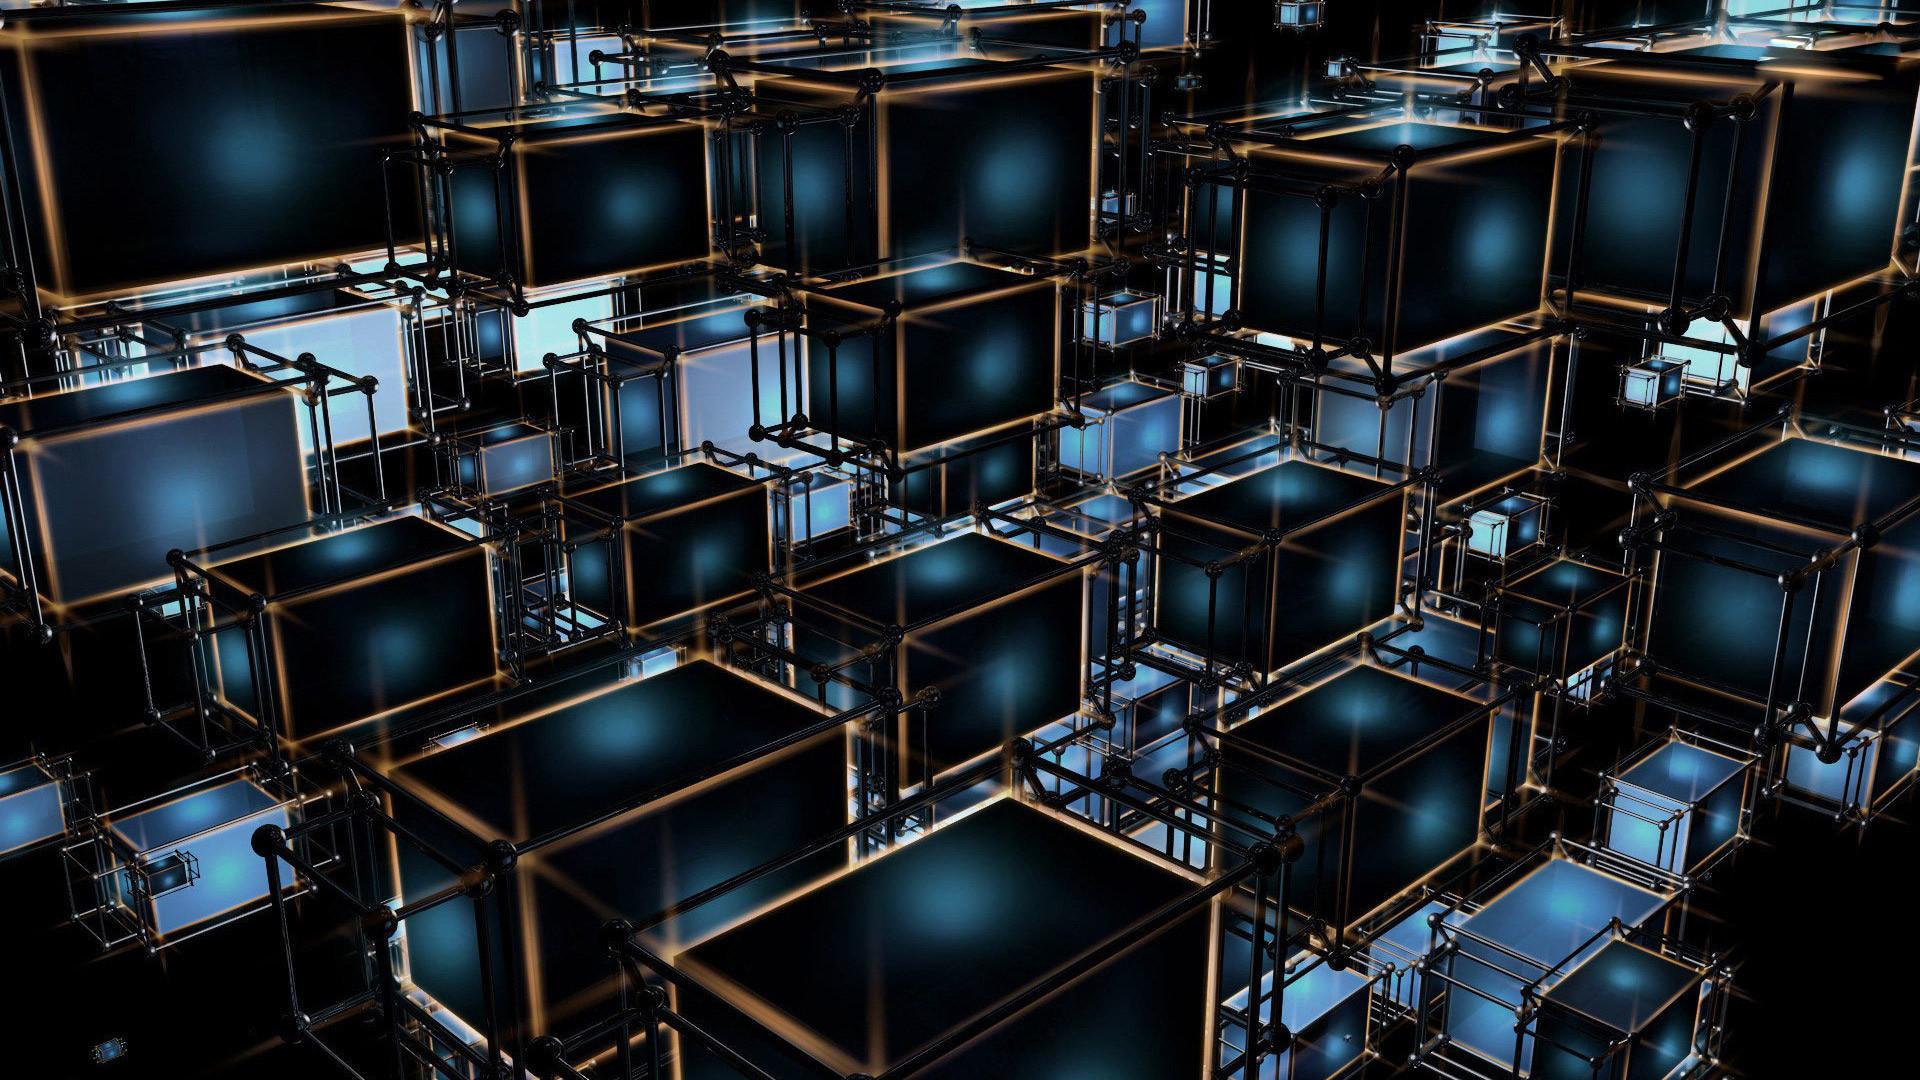 Hd 3d Wallpapers For Desktop 63 Images